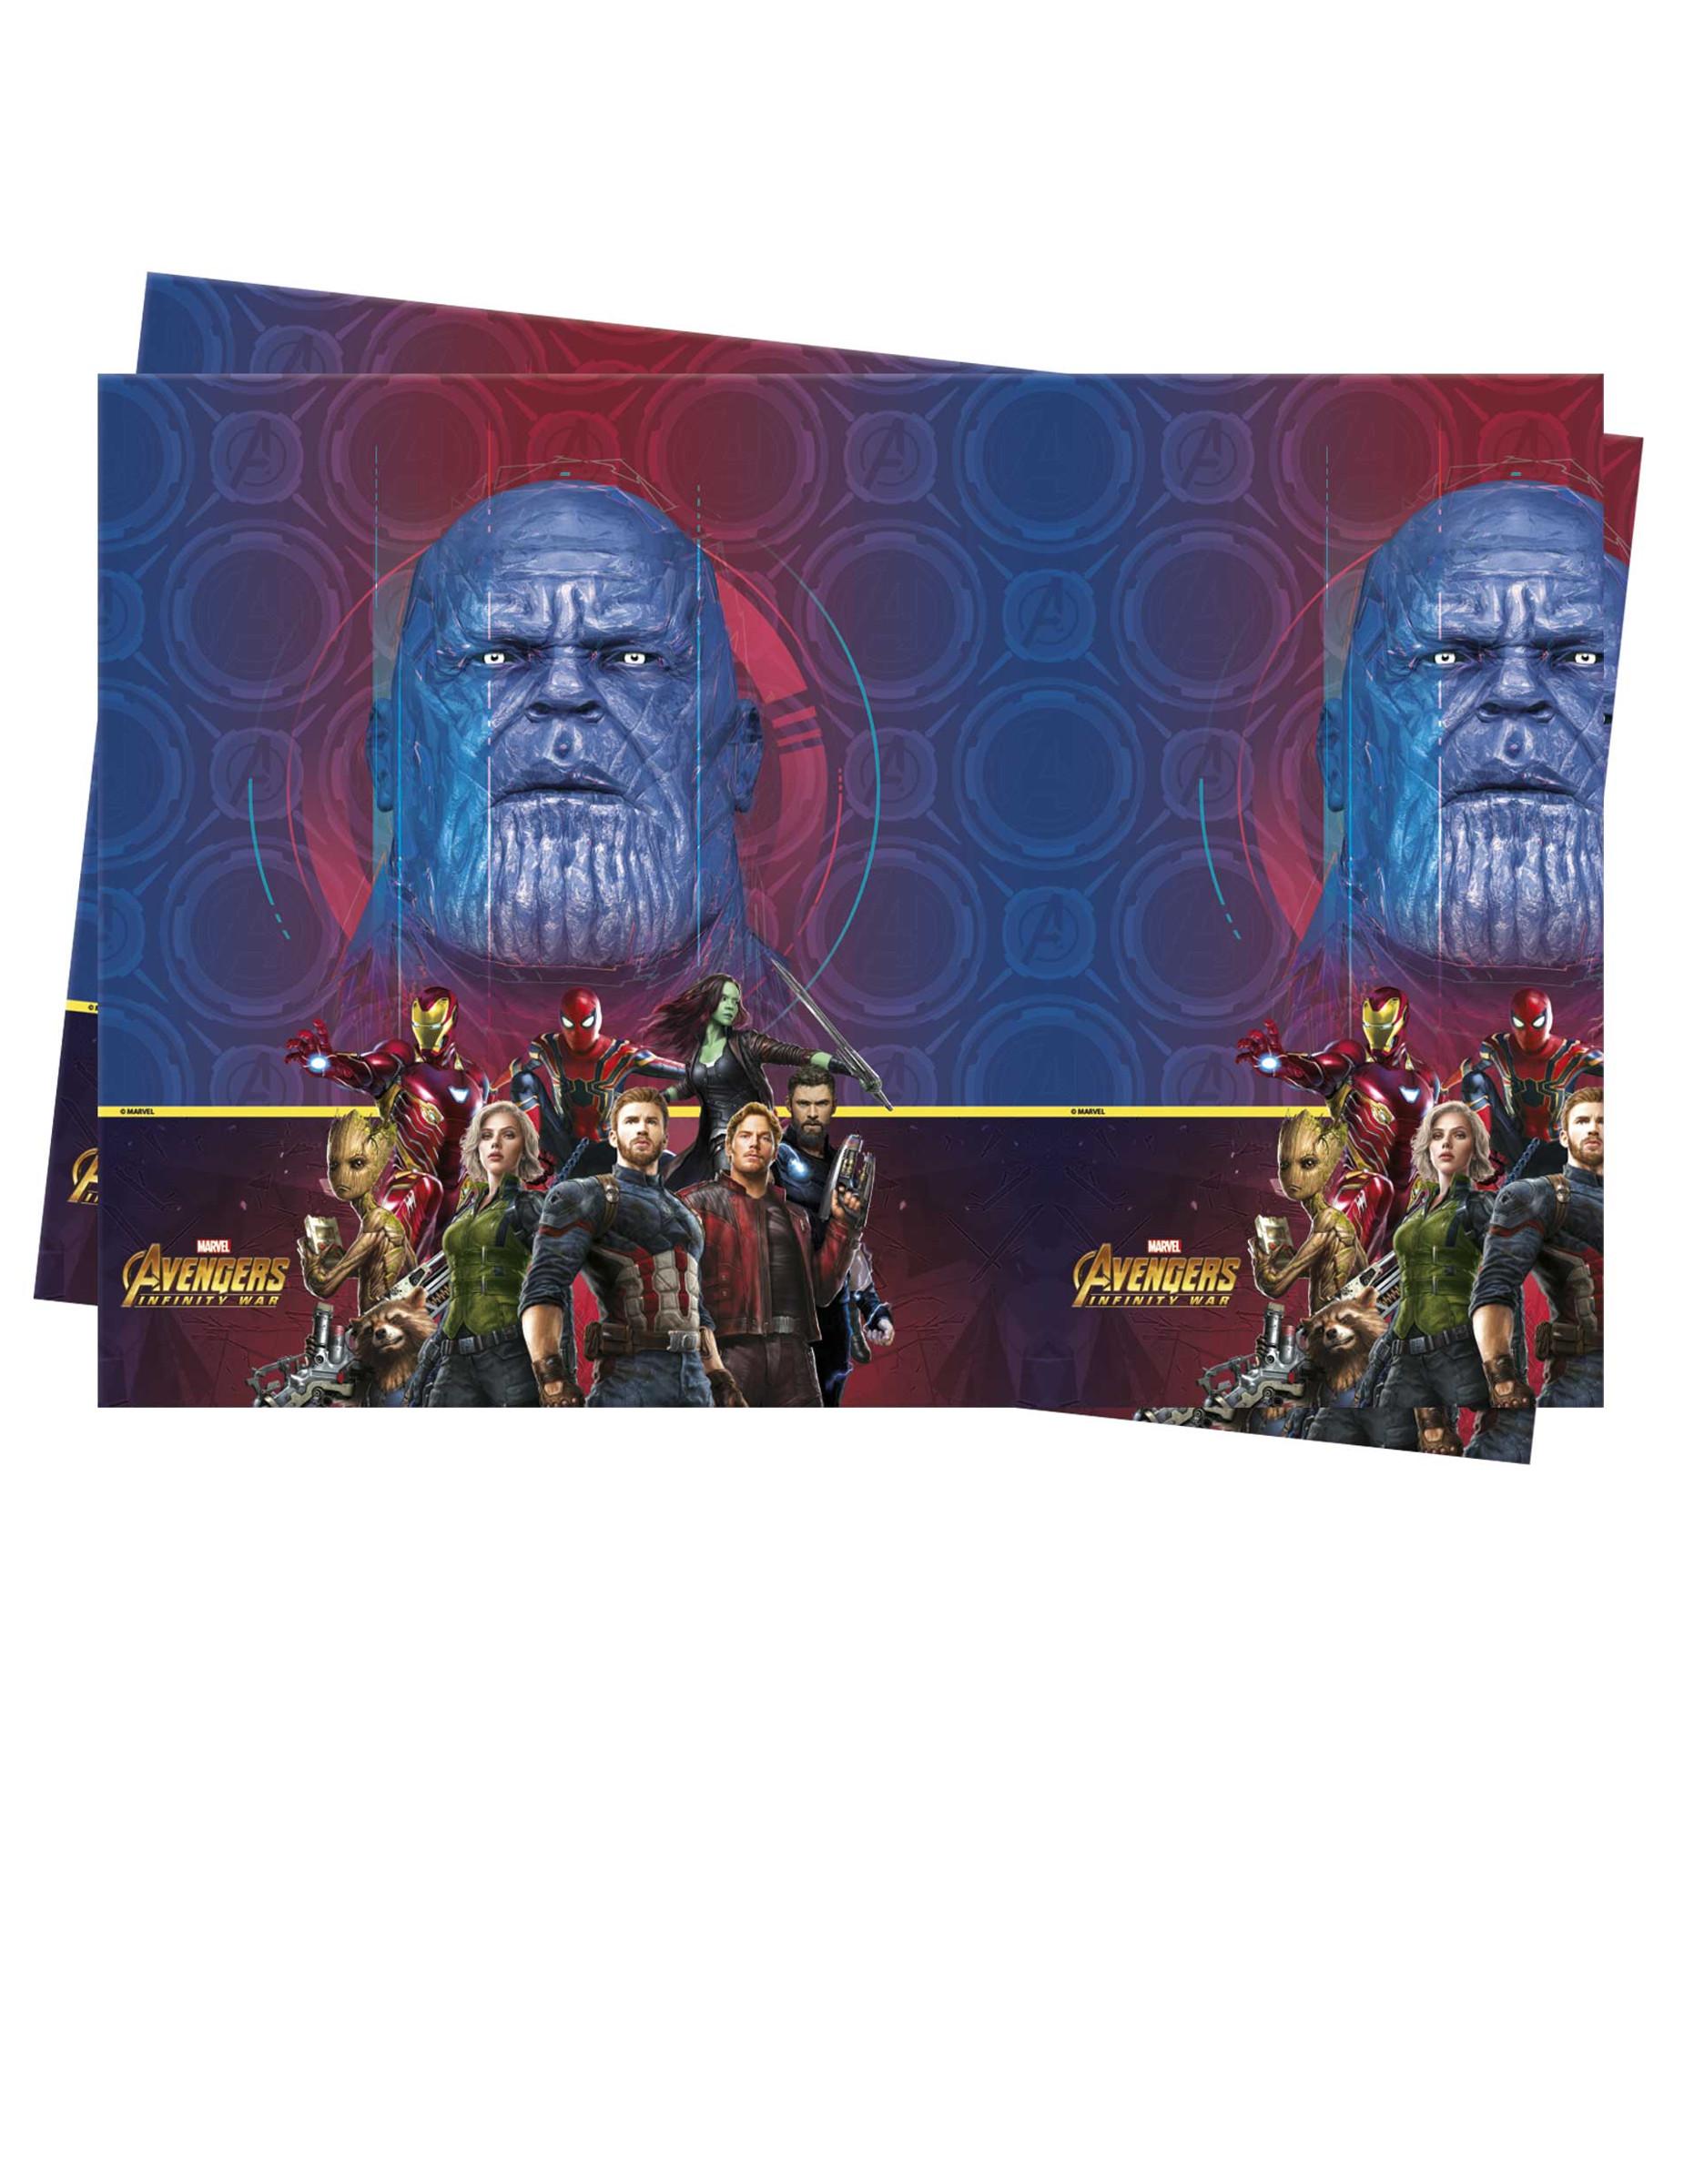 Matel De Plastico Avengers Infinity War 120 X 180 Cm Decoracion Y